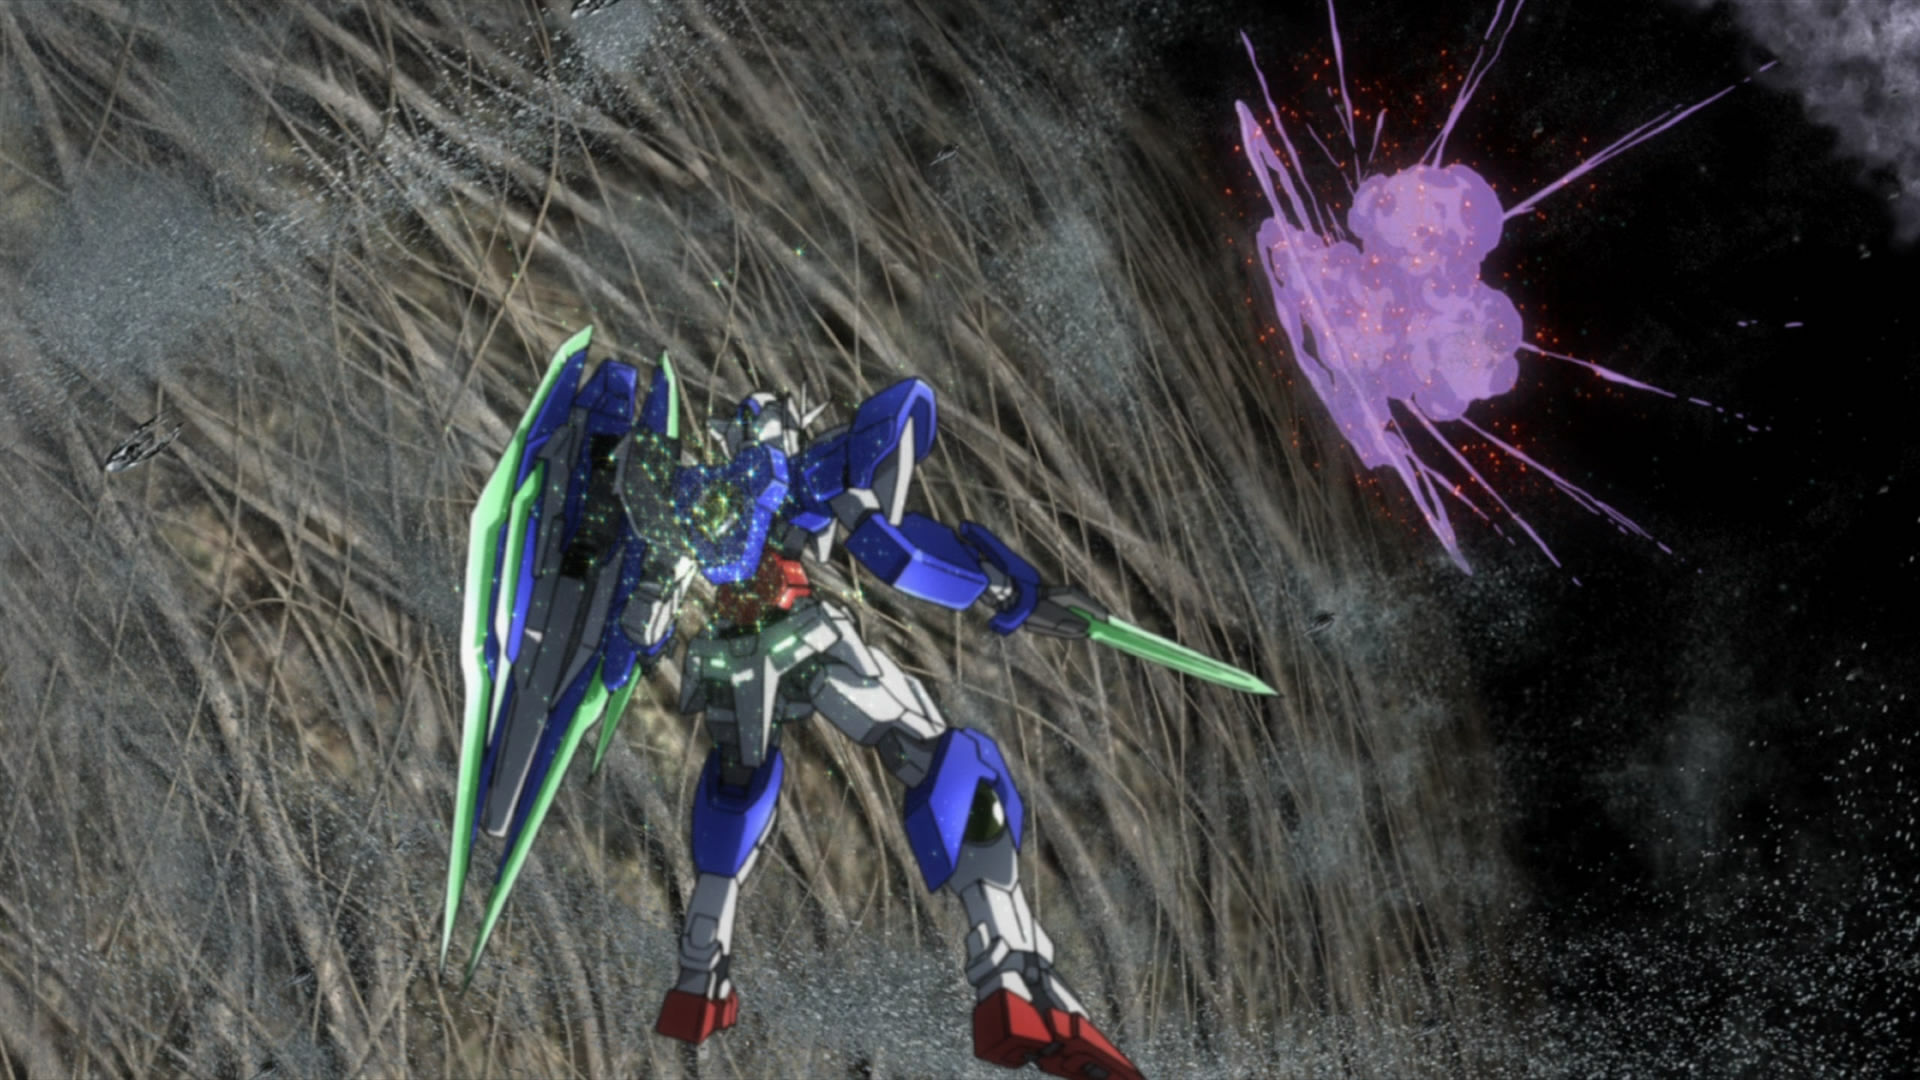 [gSS]_Mobile_Suit_Gundam_00_-_A_wakening_of_the_Trailblazer_(1080p)_[2B252856].mkv_snapshot_01.44.39_[2011.01.07_04.47.47]